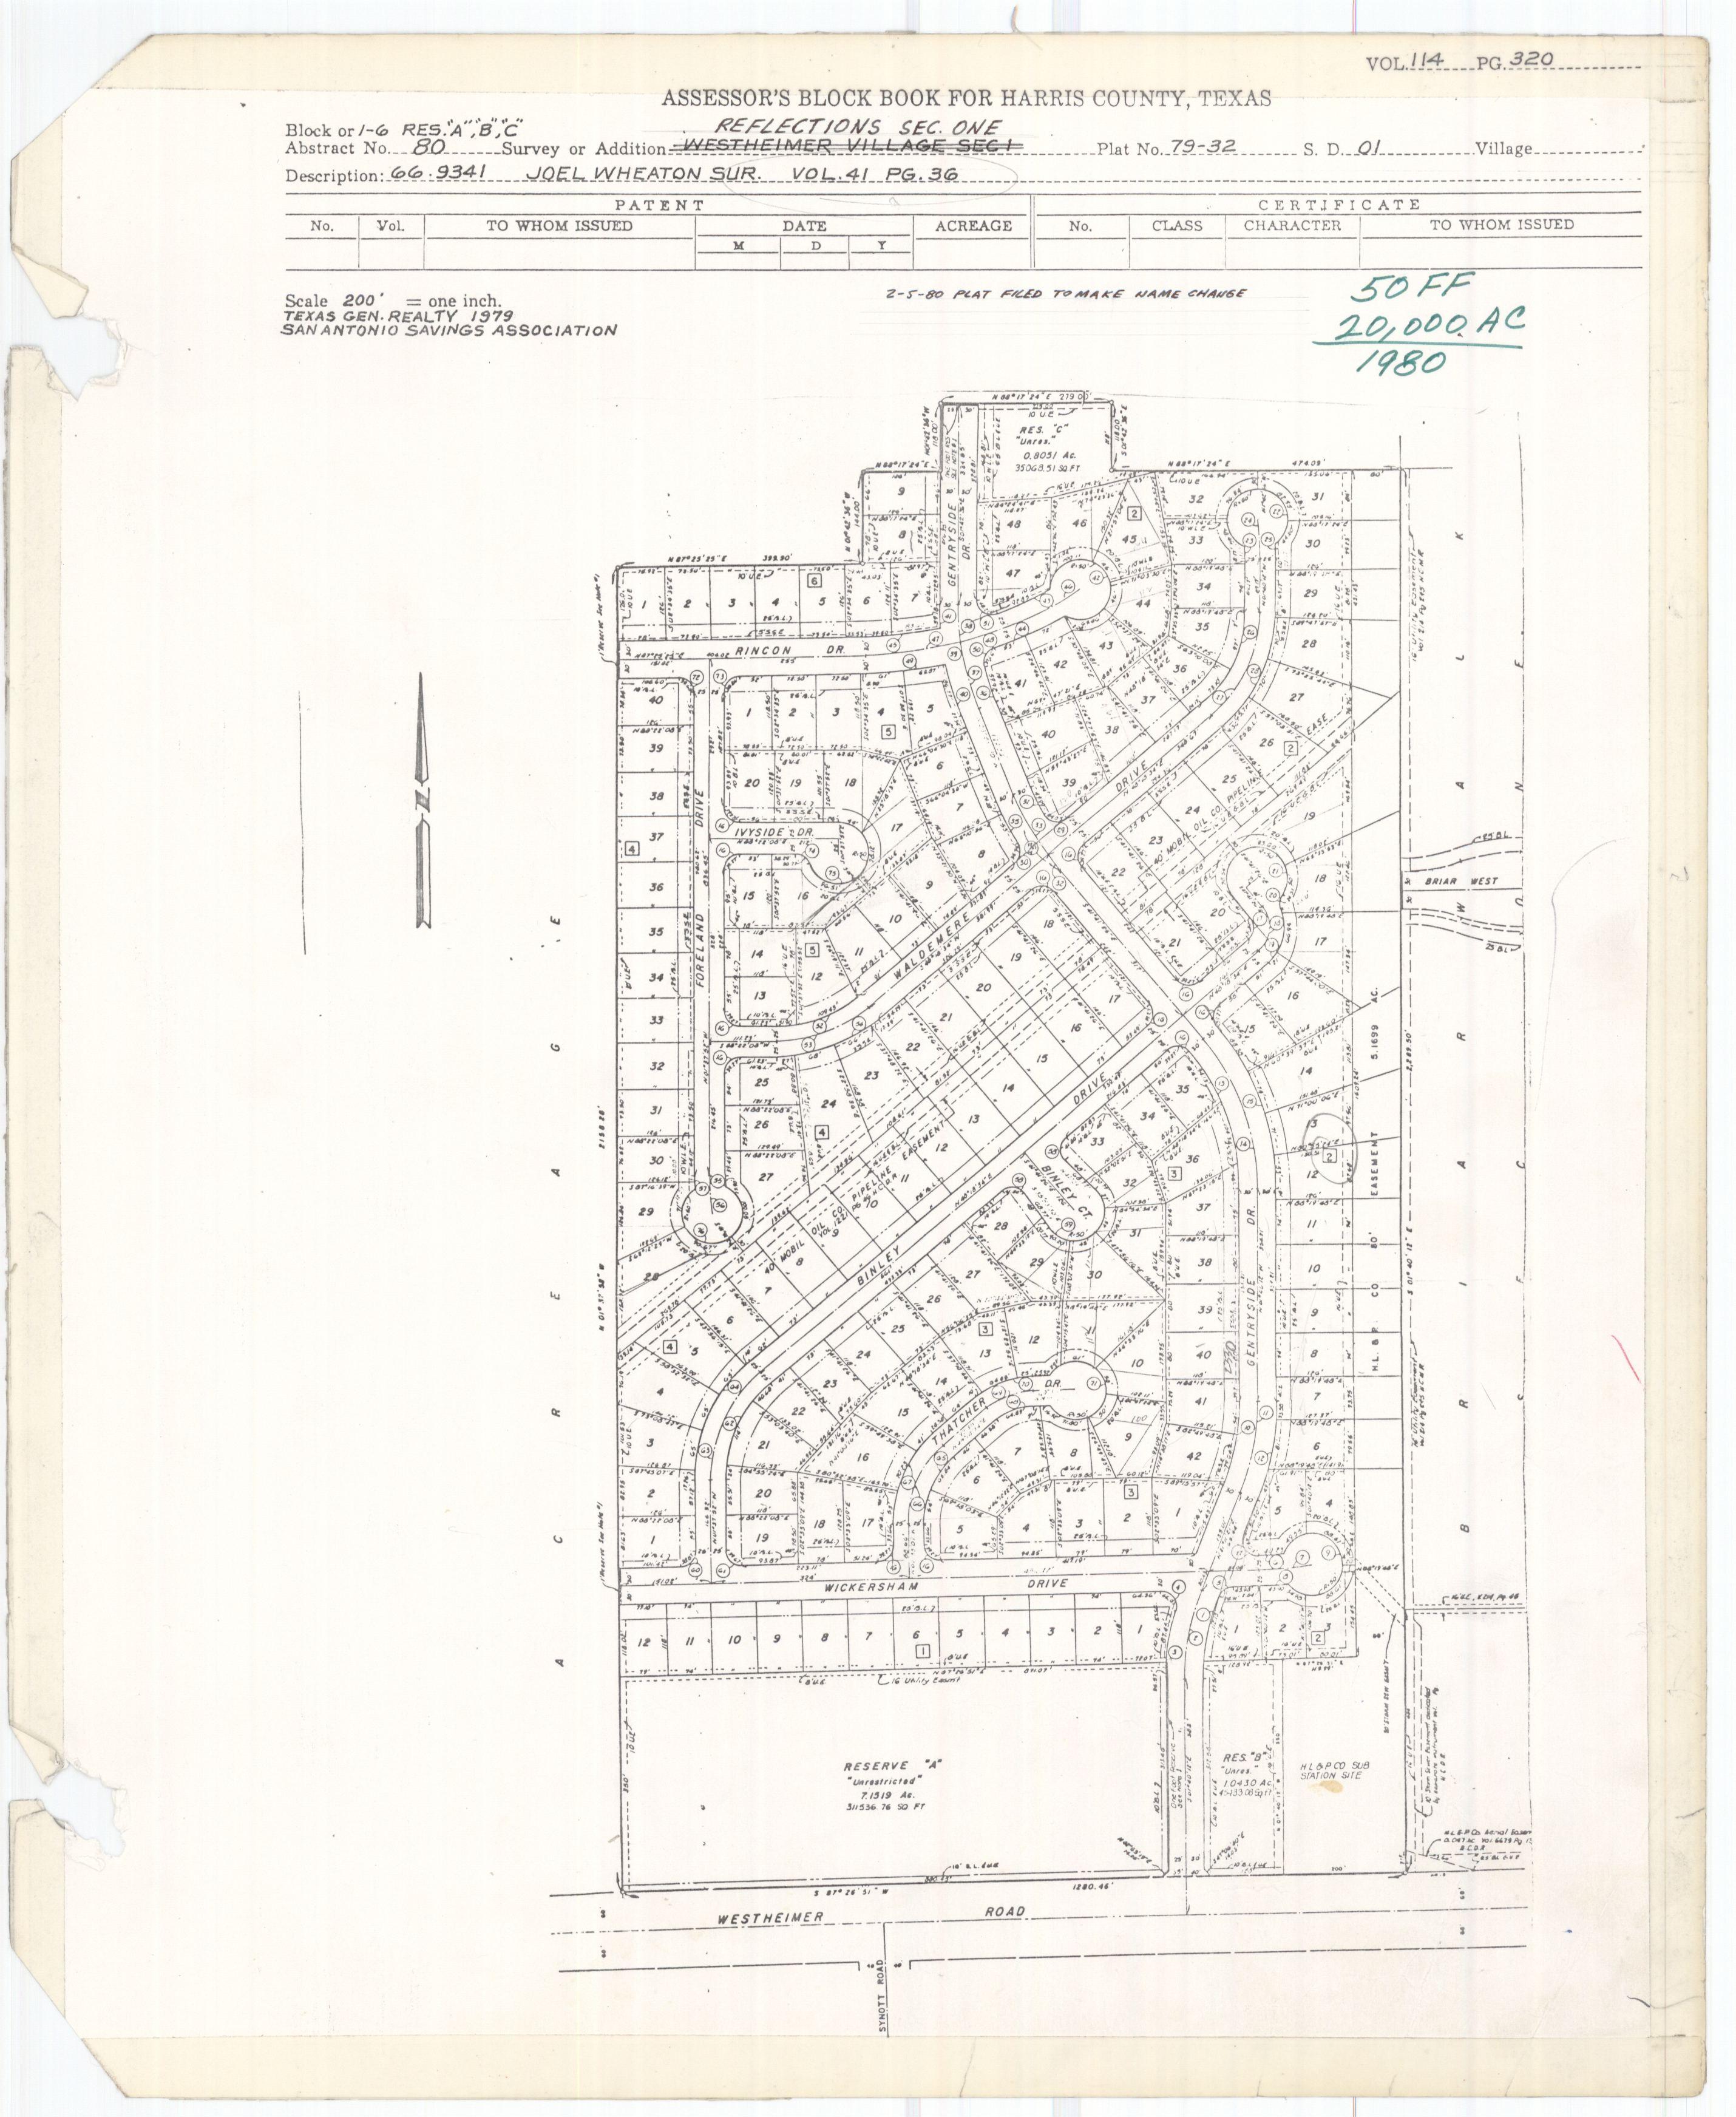 Apartments For Sale Texas: Advice On Westside Neighborhoods (Houston, Sugar Land: For